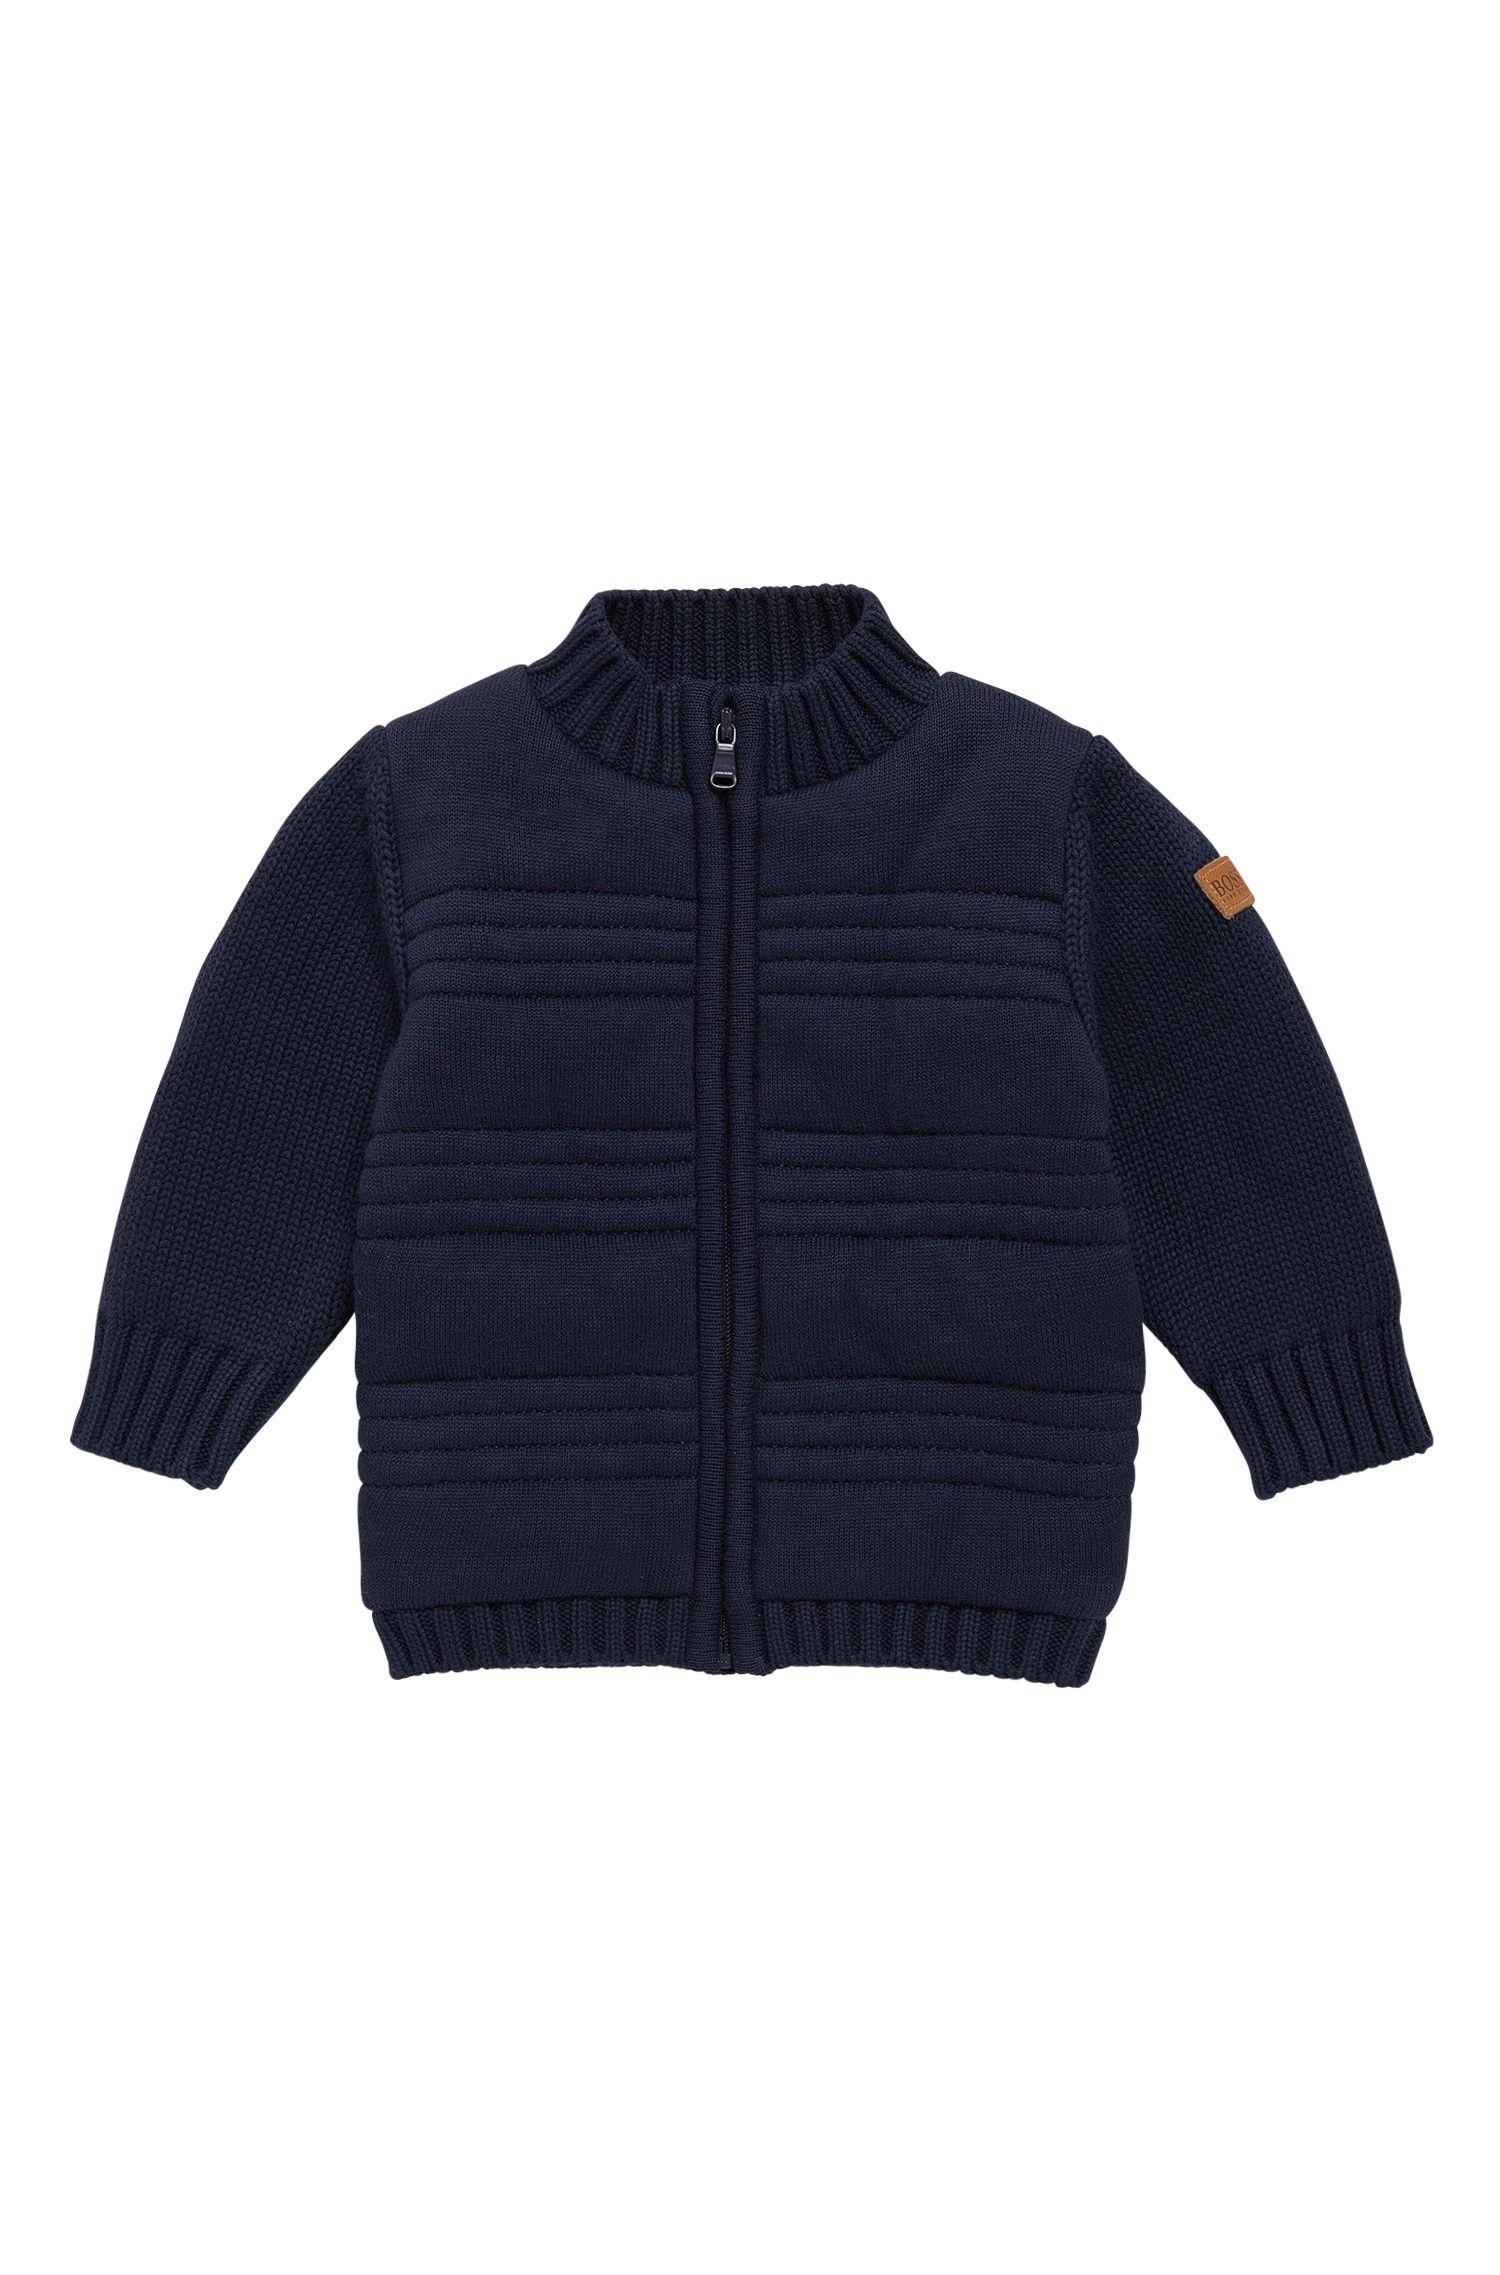 'J05522' | Toddler Stretch Cotton Blend Zip Cardigan